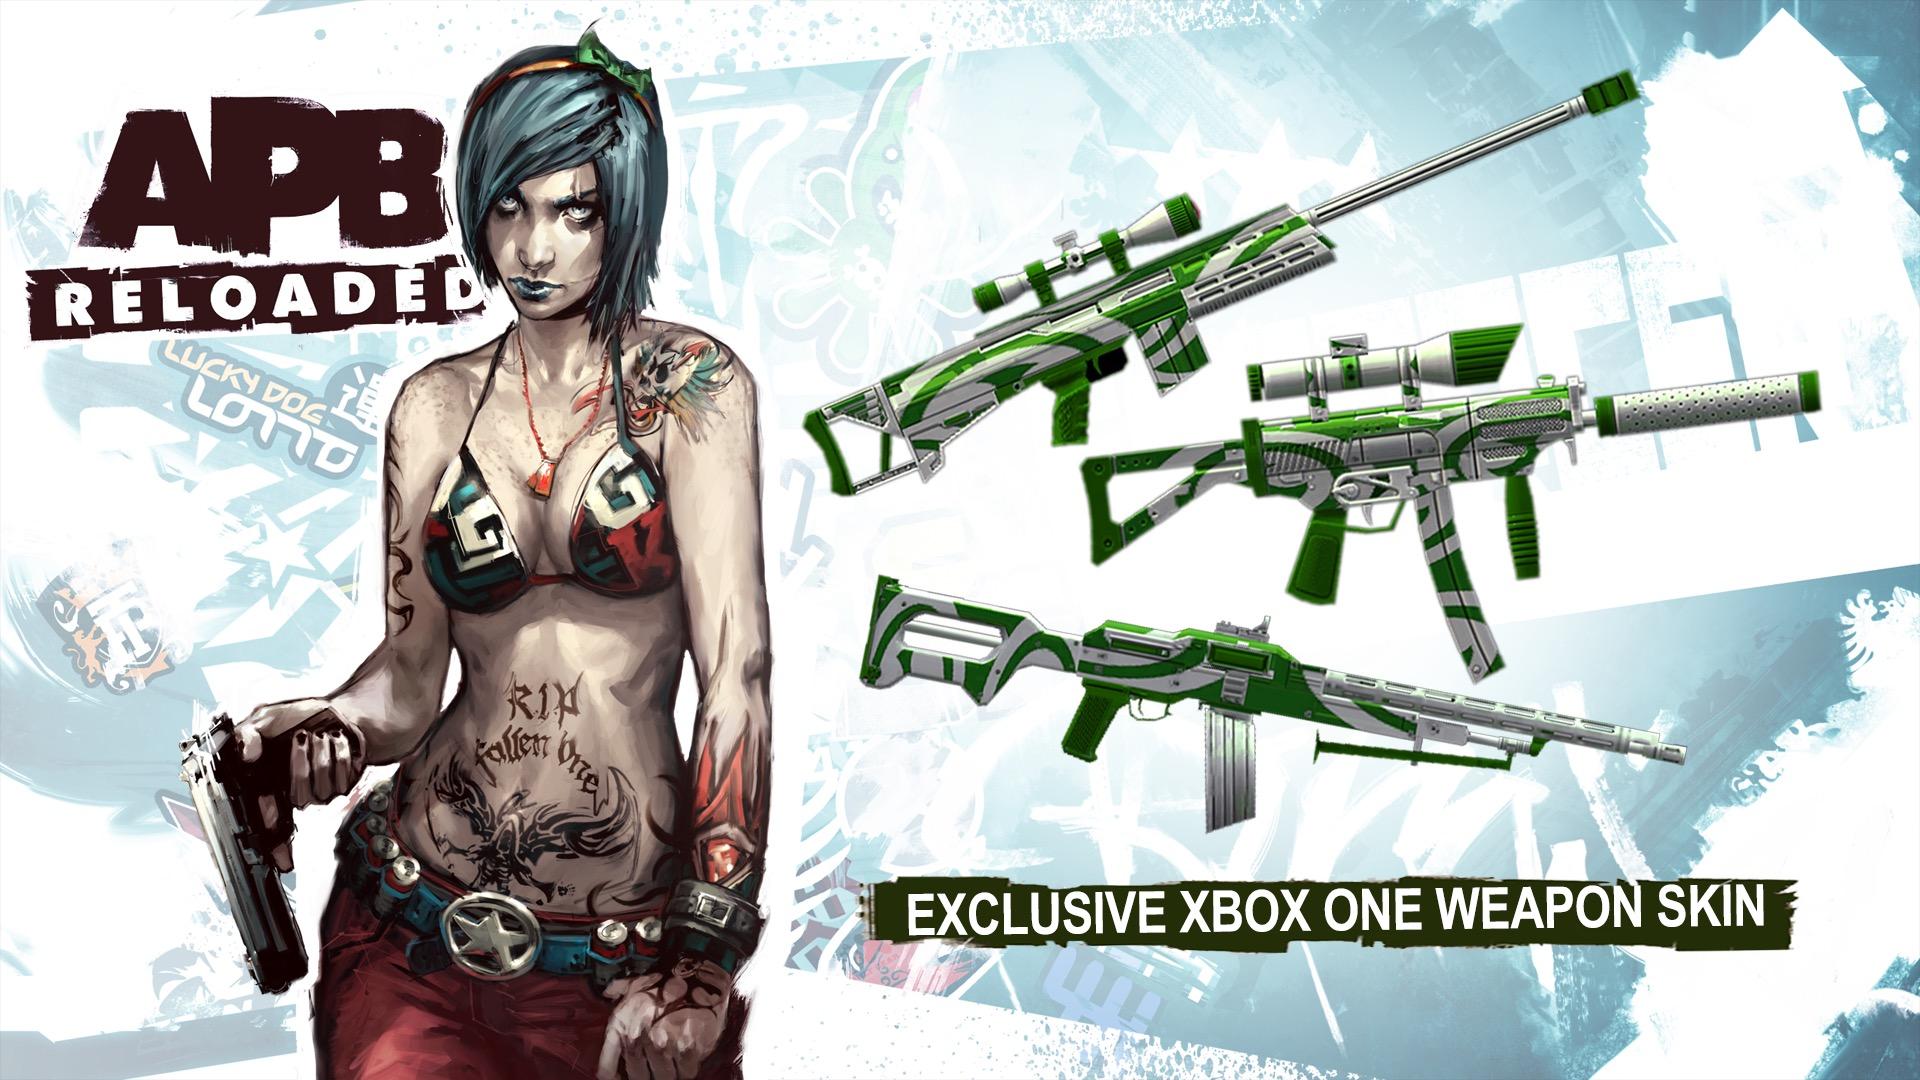 APBReloaded_Exclusive XB1 Weapon Skin